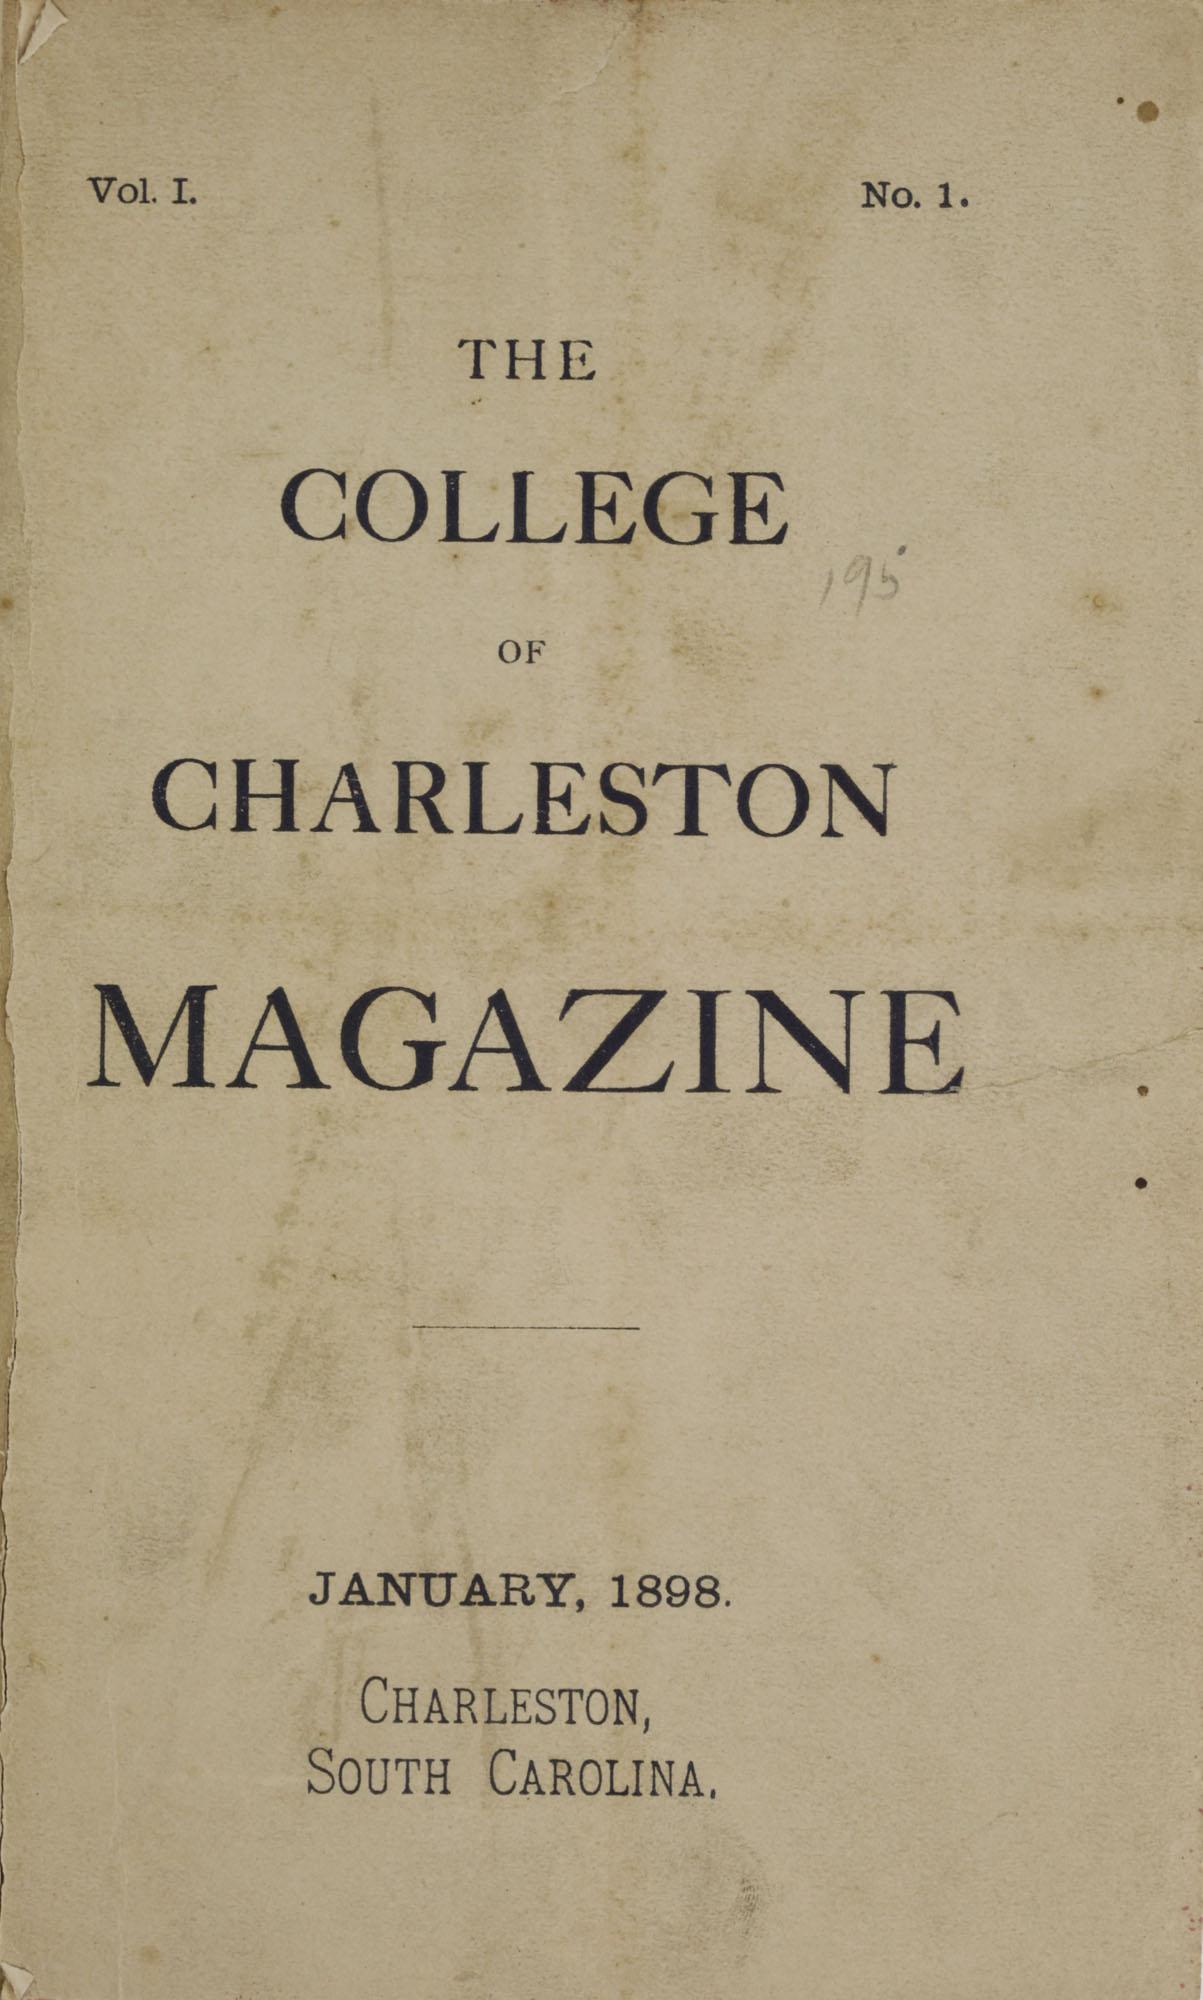 College of Charleston Magazine, 1898, Vol I. No. 1, title page